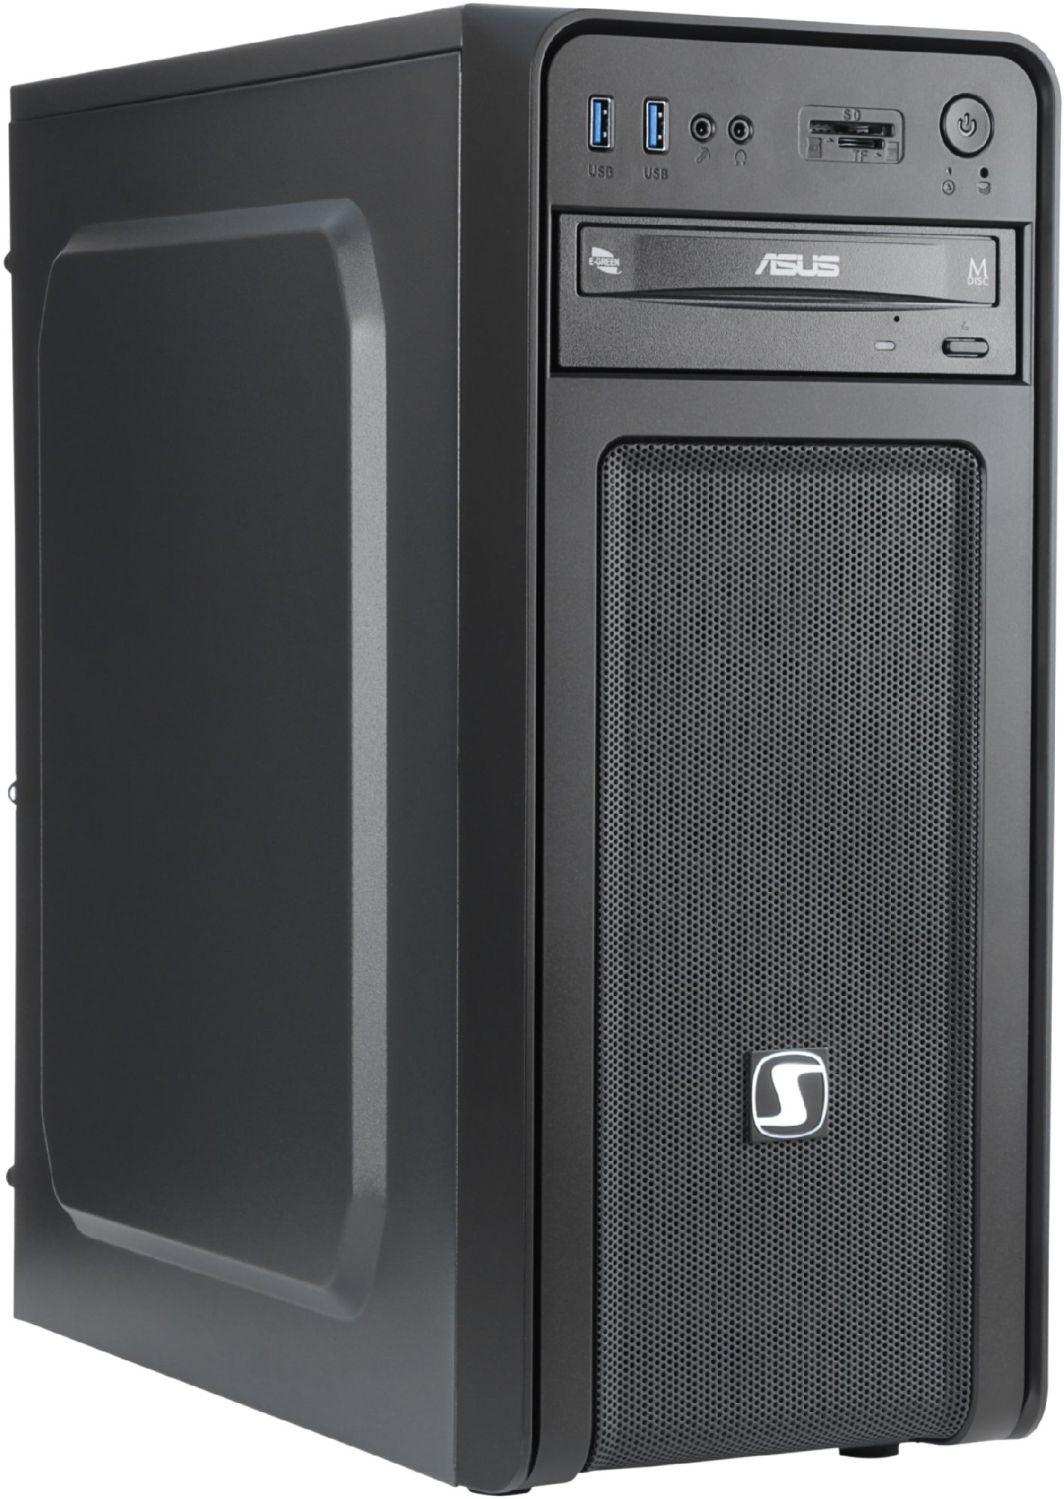 Komputer Ender Boosted Pentium G4600, 8 GB, GTX 1050, 1 TB HDD  1